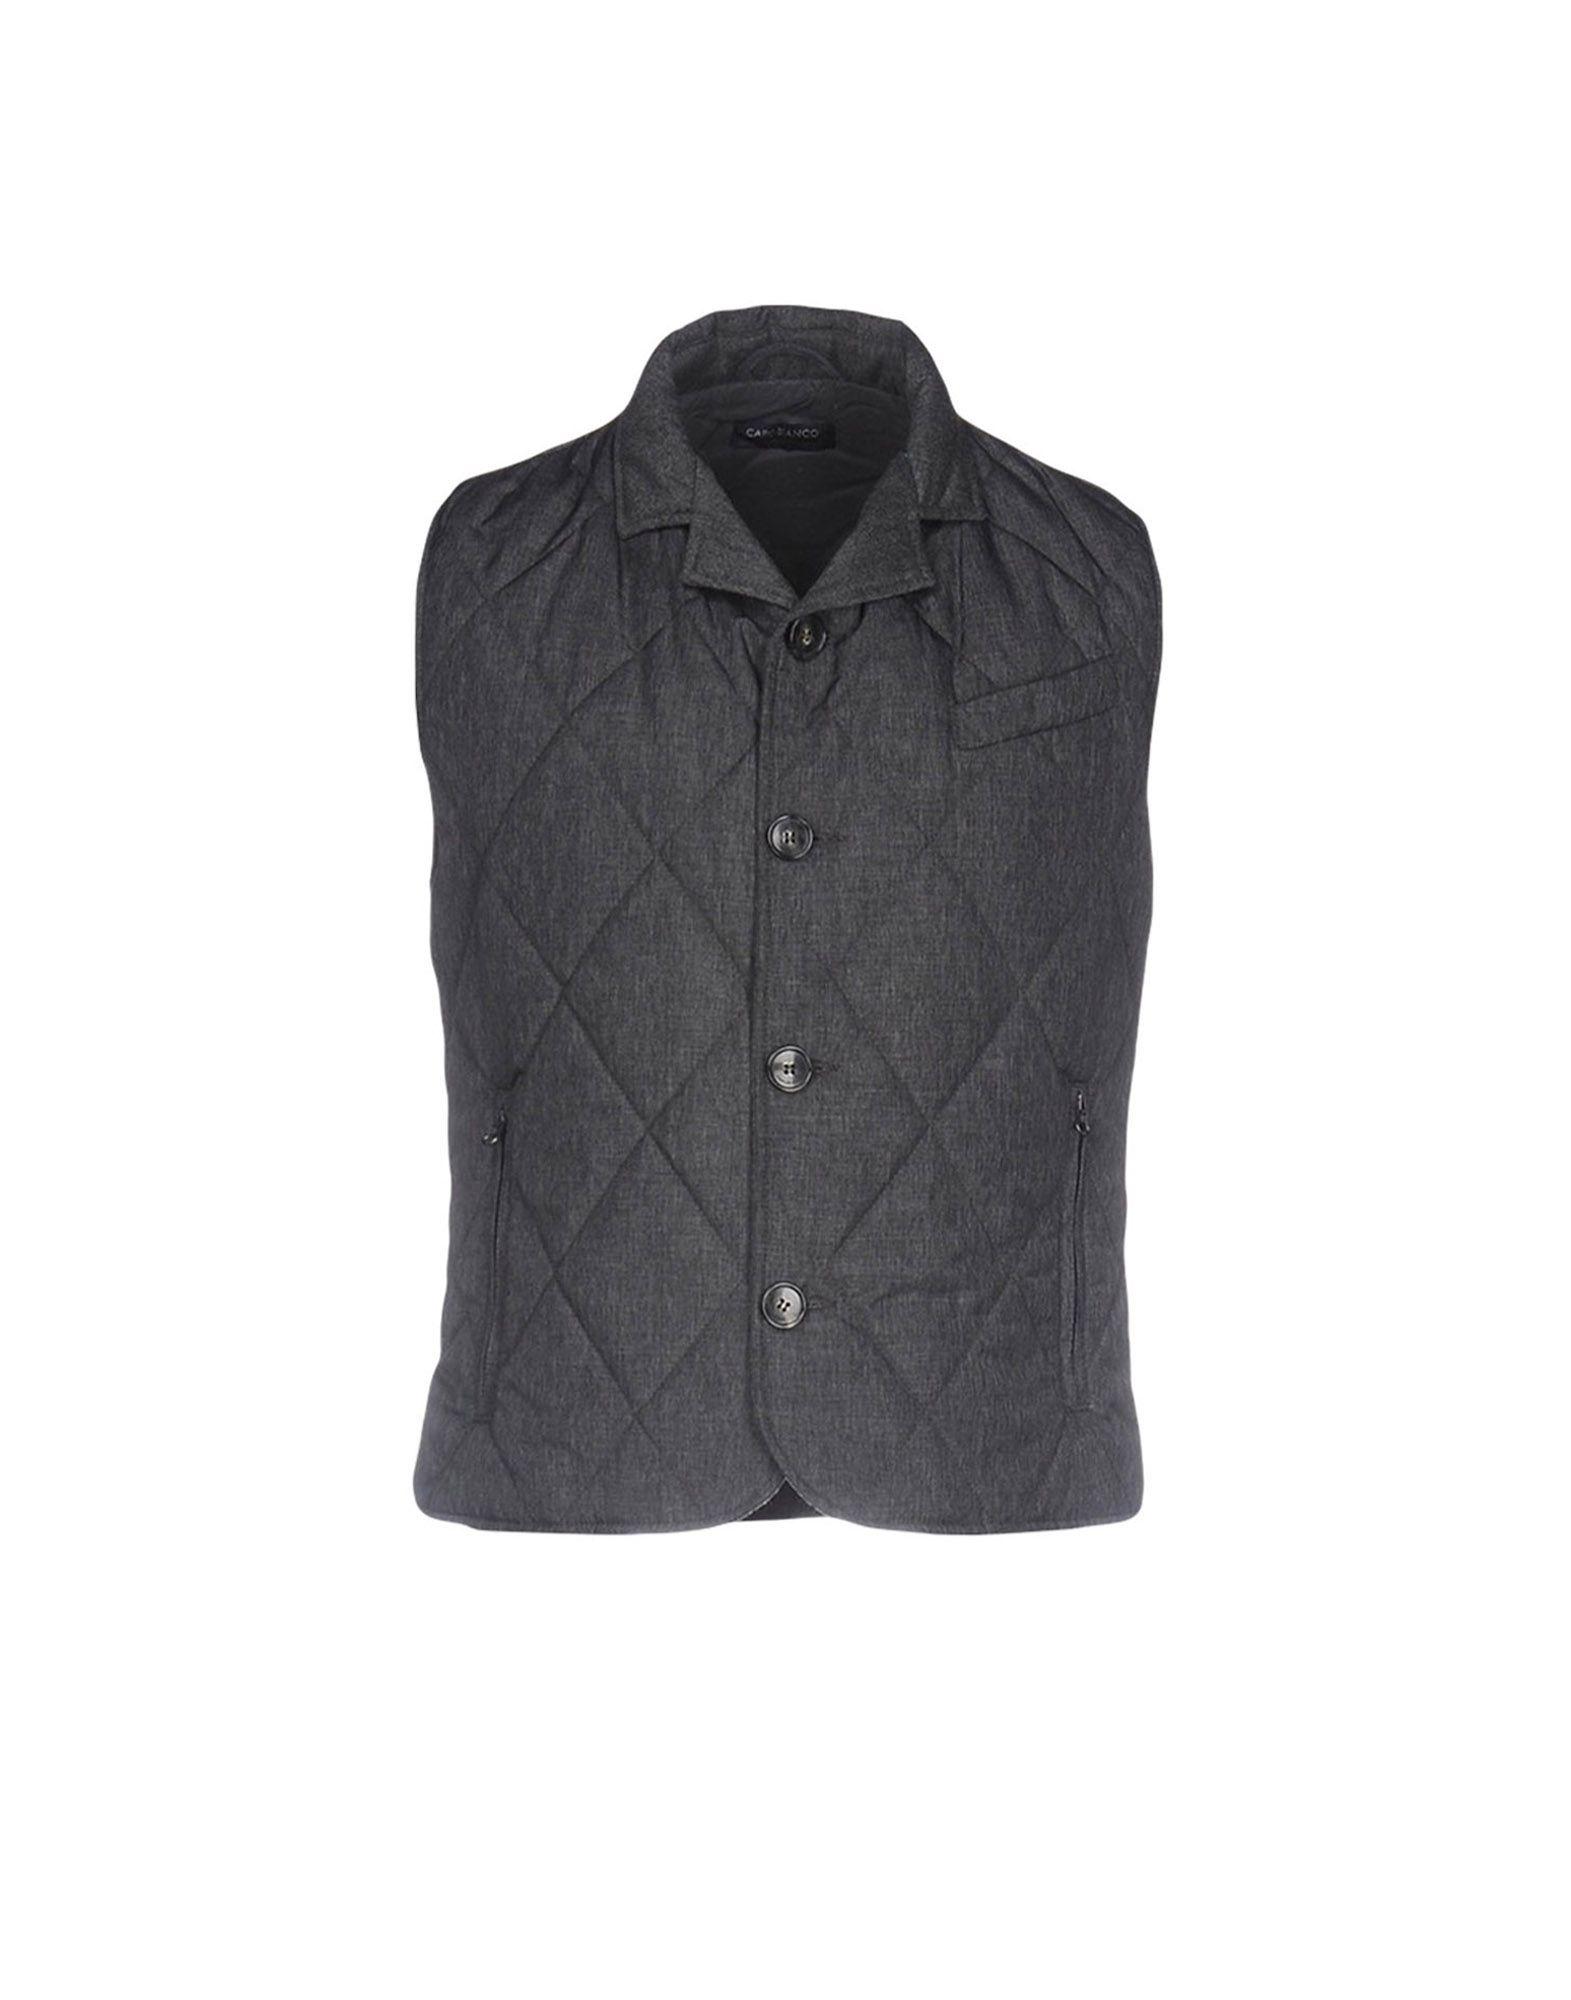 CAPOBIANCO Herren Jacke Farbe Grau Größe 3 - broschei